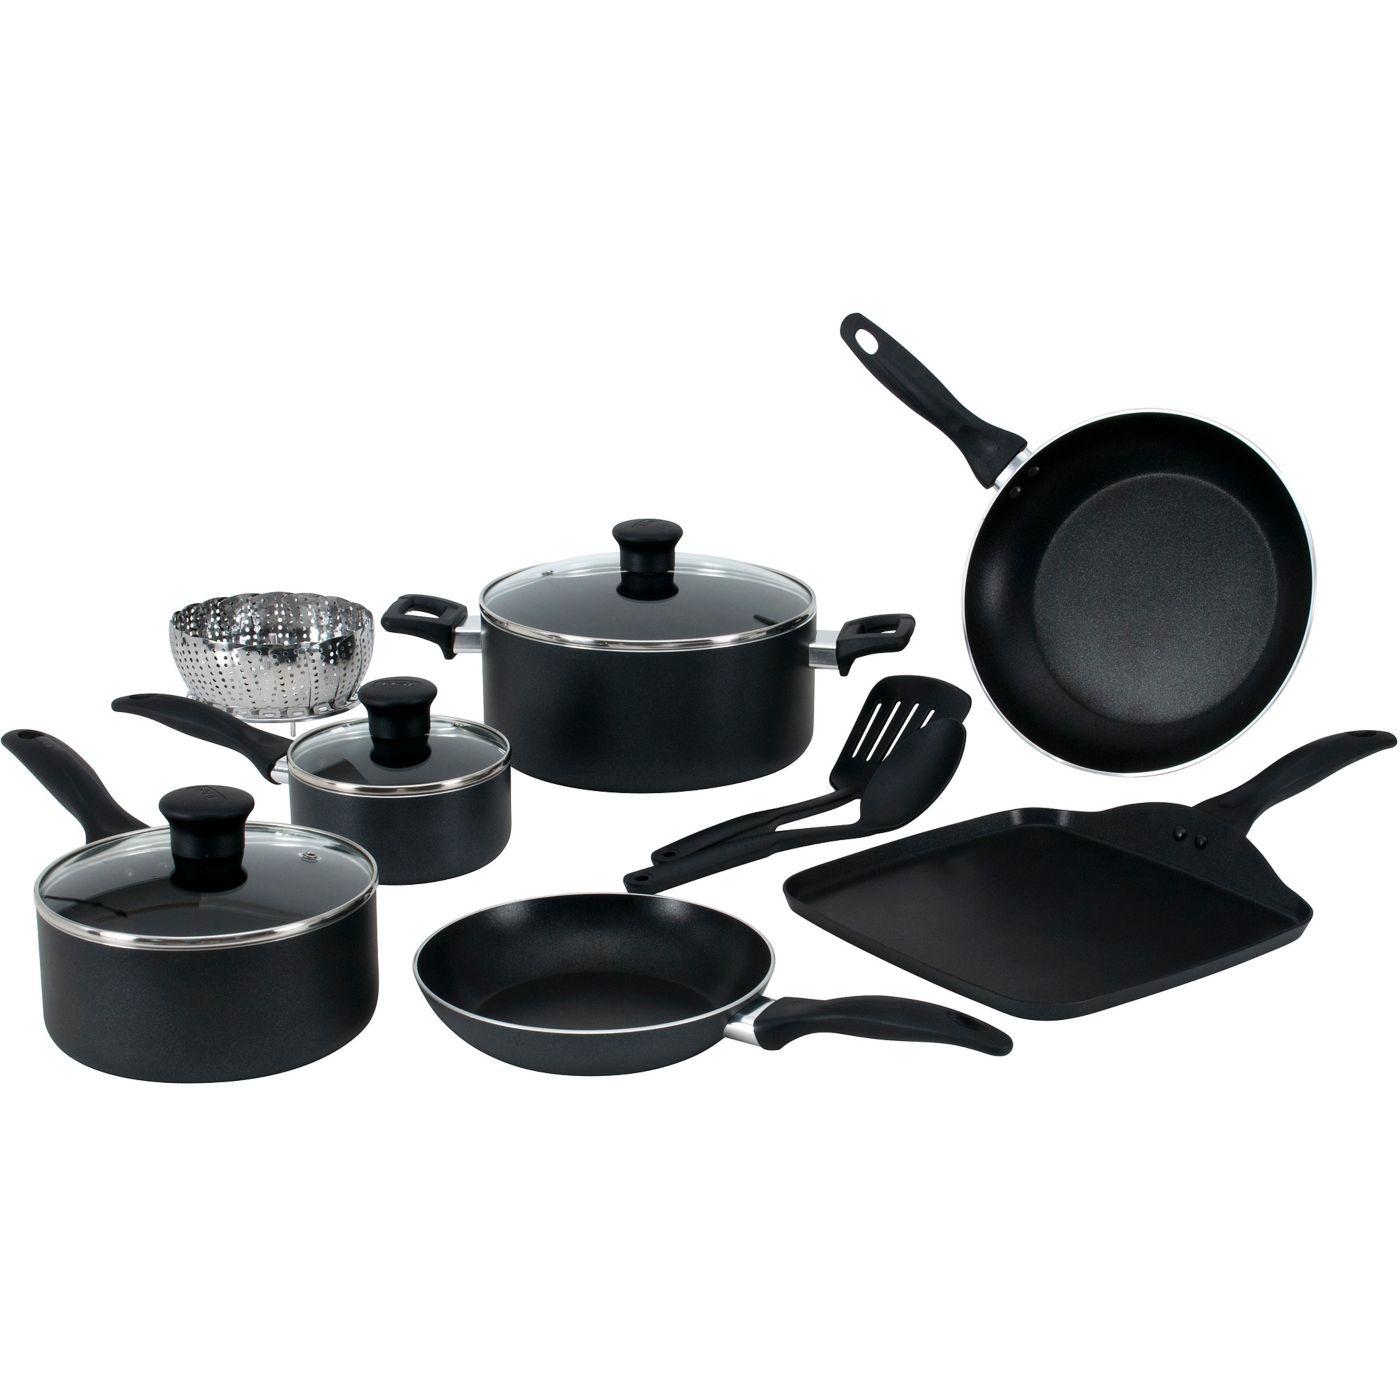 T-fal, Easy Care Nonstick, B145SA, Dishwasher Safe Cookware, 12 Pc  Set,  Black